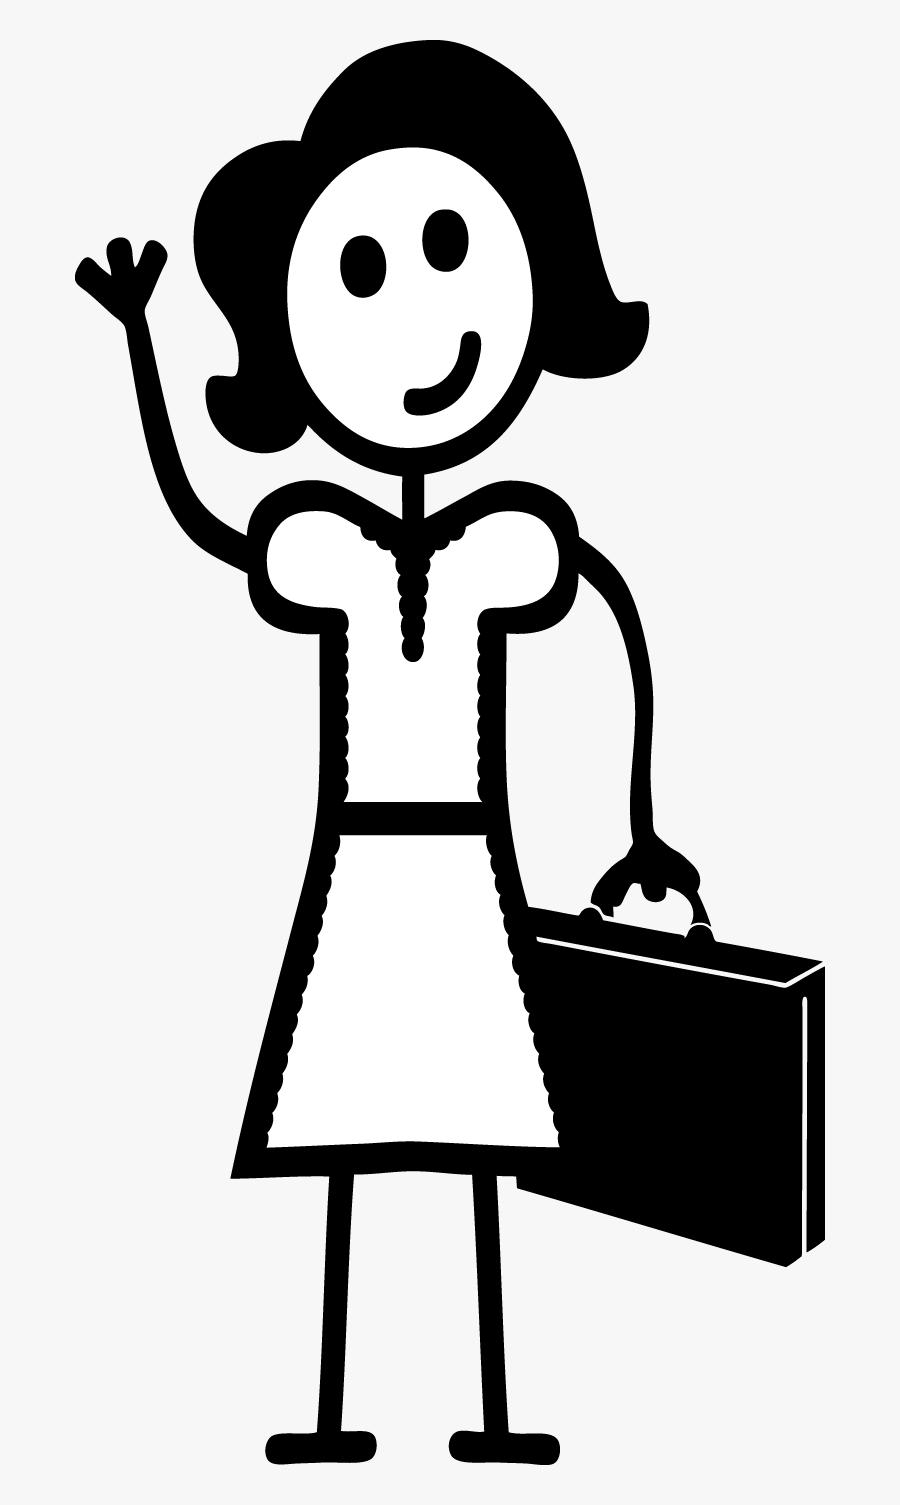 Transparent Stick Figure Family Clipart - Stick Figure Mom Clip Art, Transparent Clipart